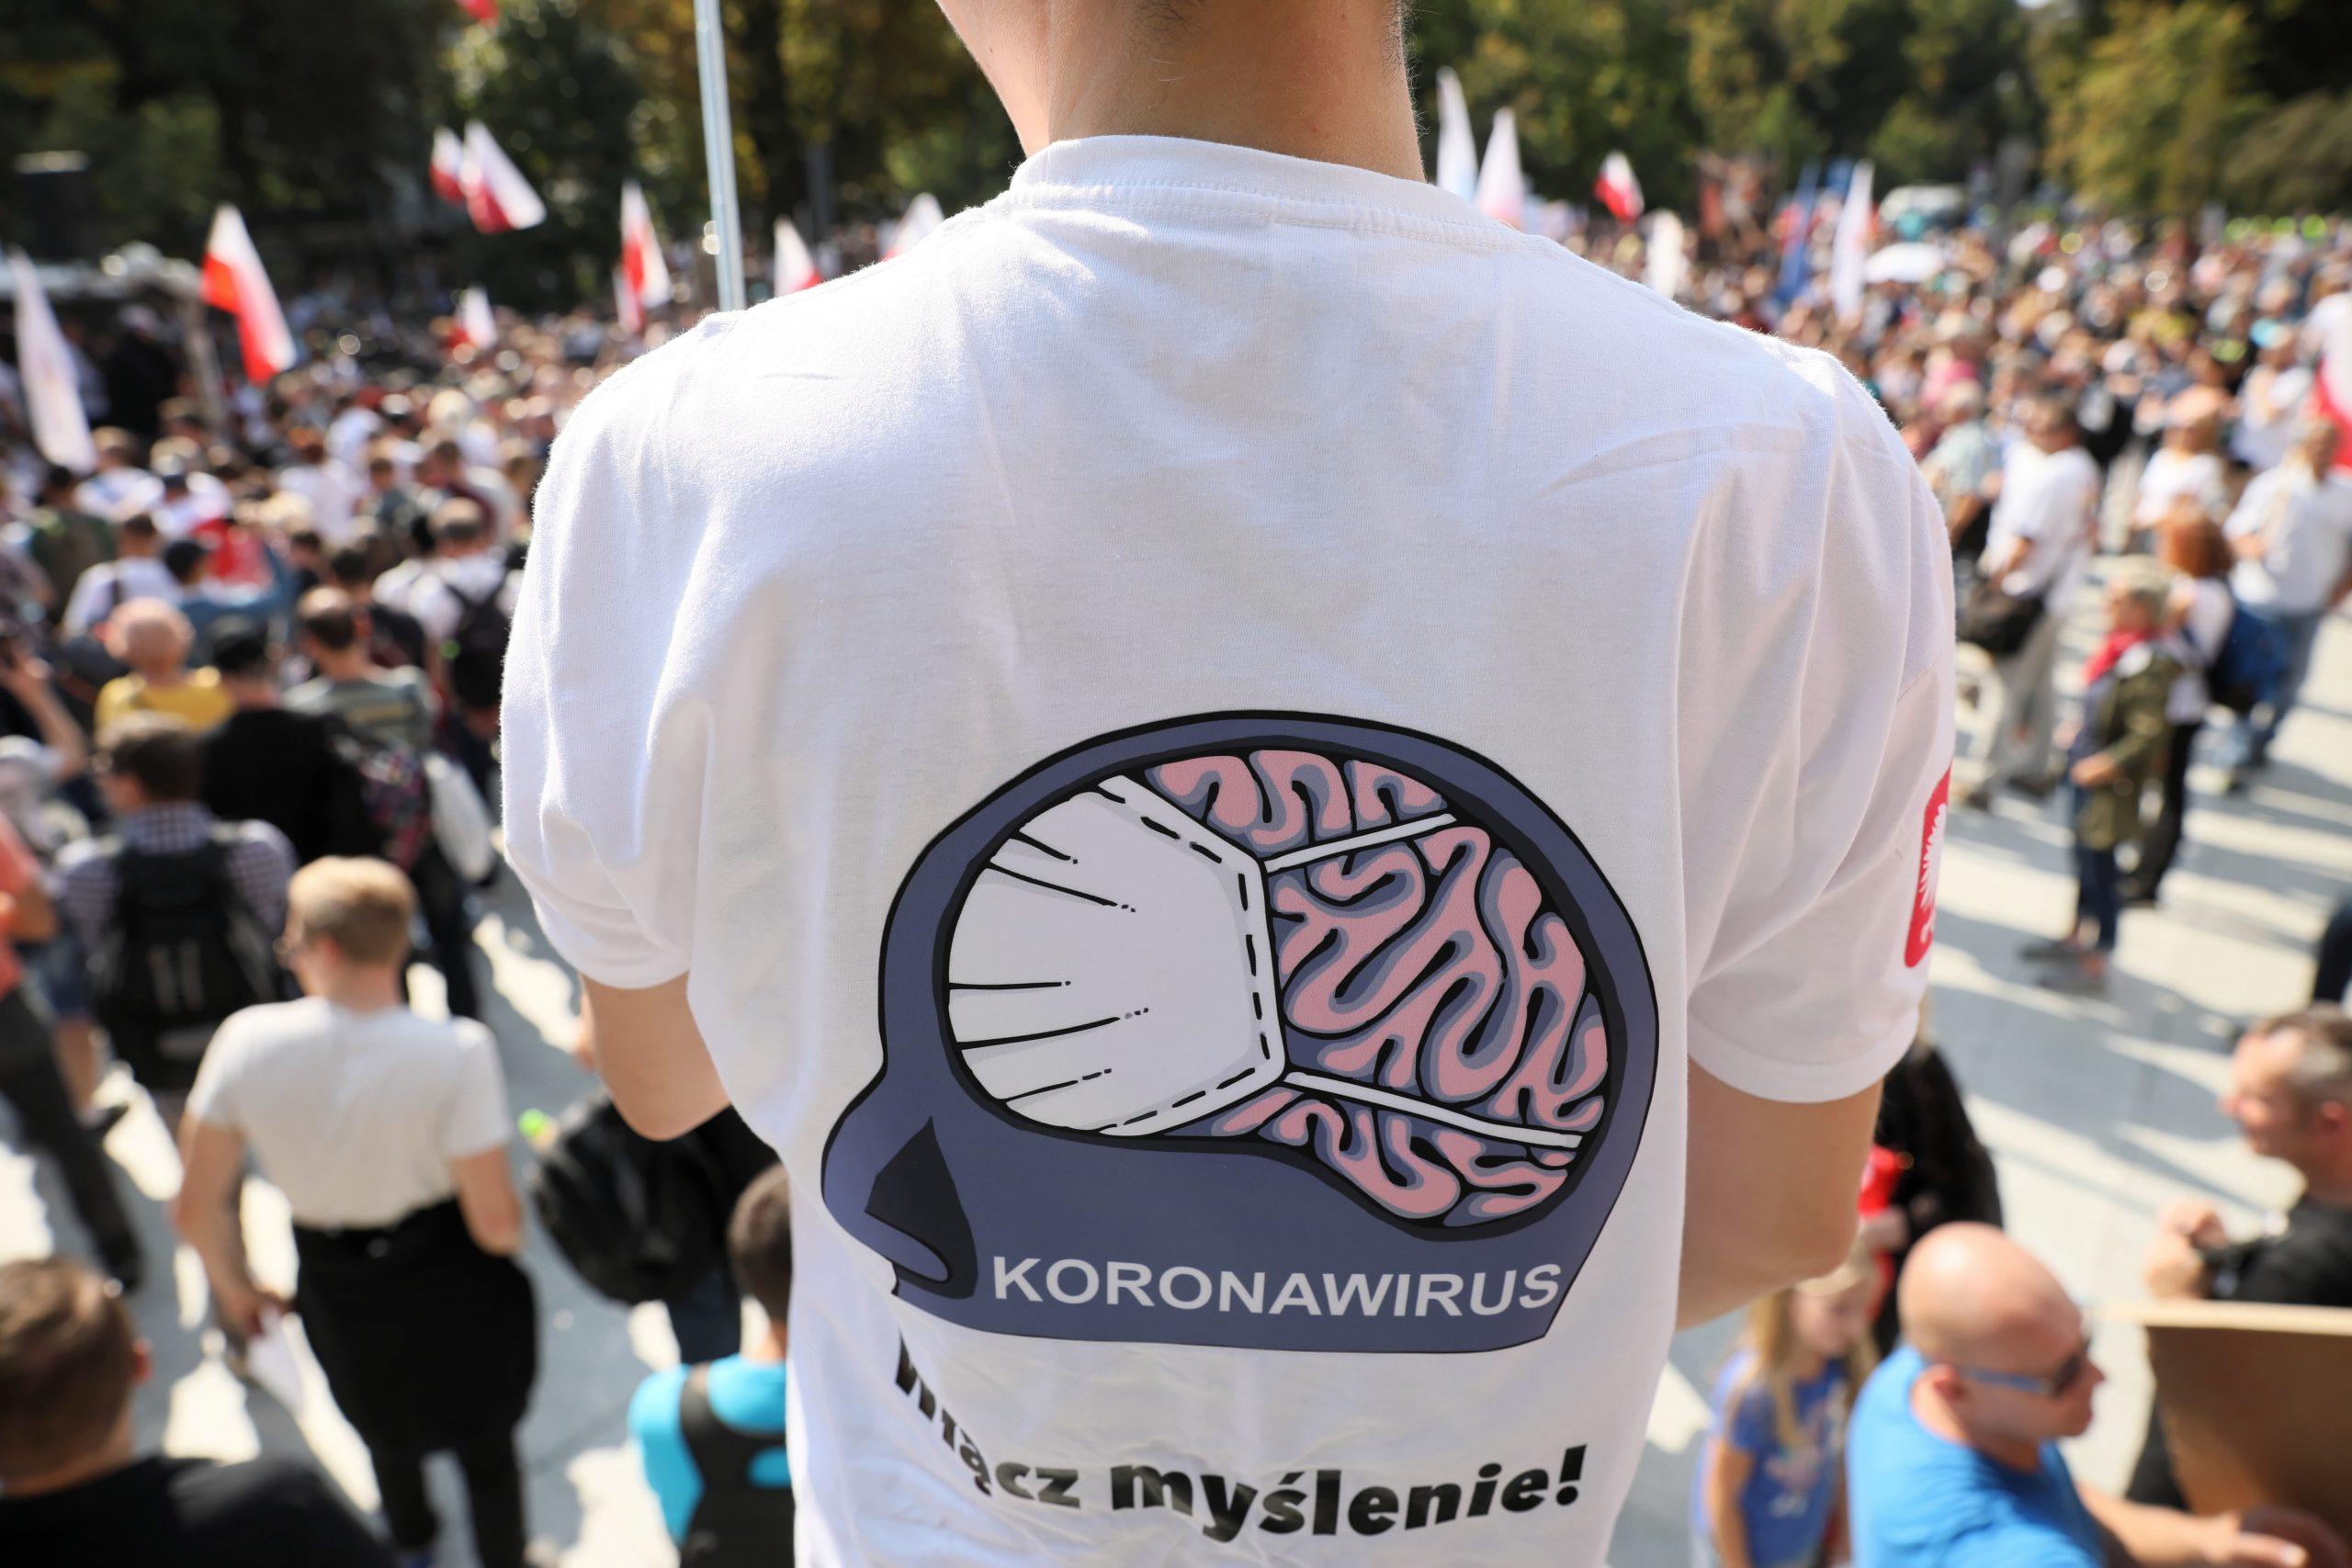 Coronavirus Skeptics Protest against Covid-19 Restrictions in Budapest